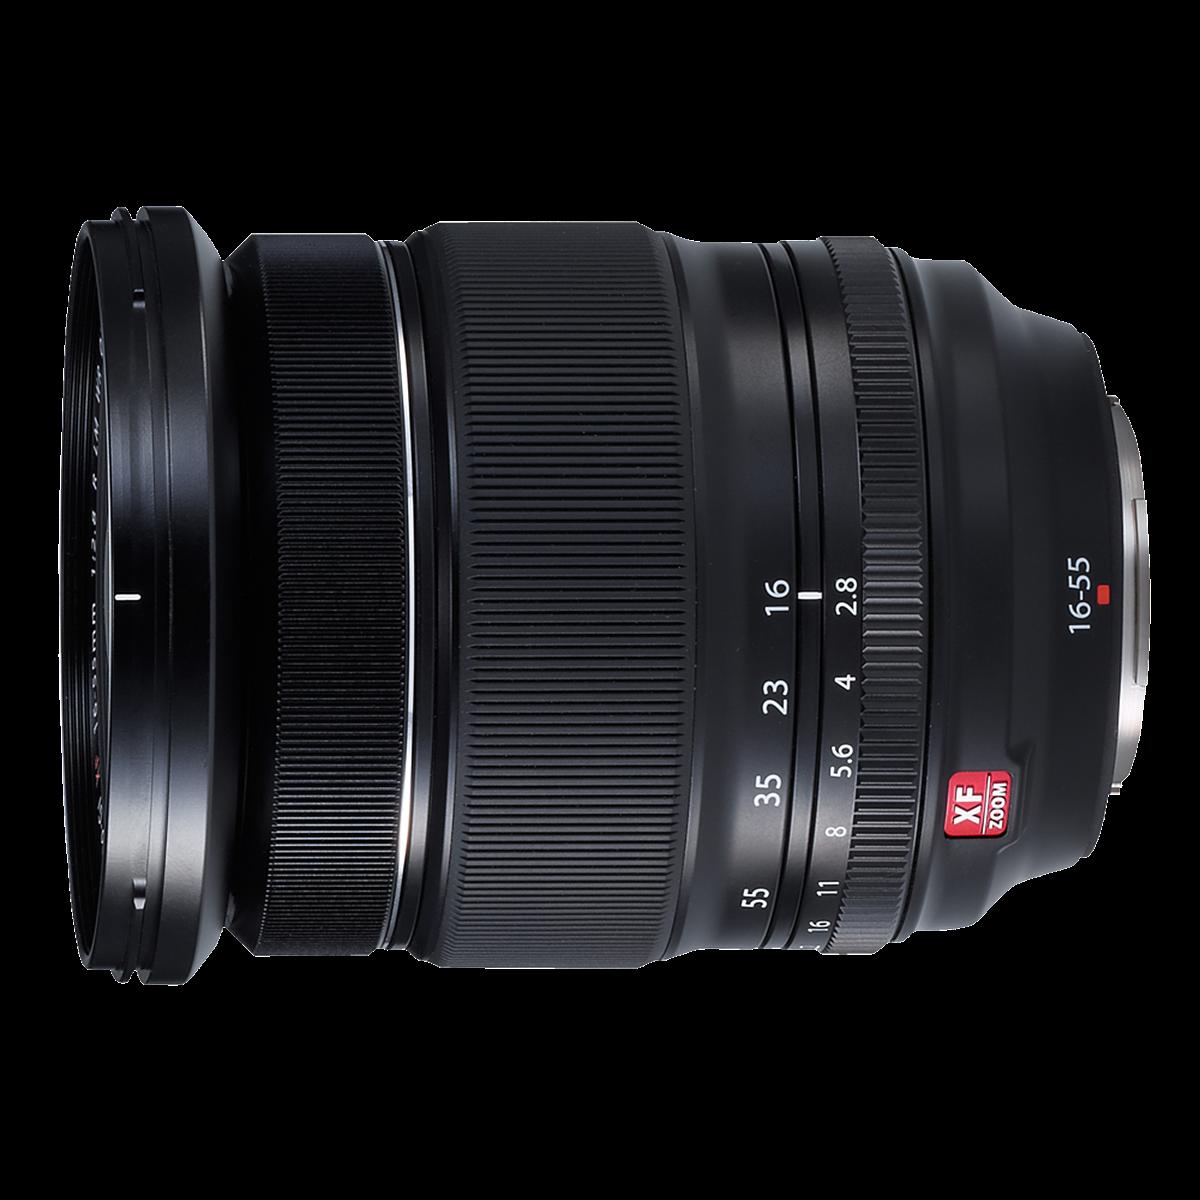 Fujifilm Announces Xf 16 55mm F2 8 R Lm Wr Lens Digital Photography Review